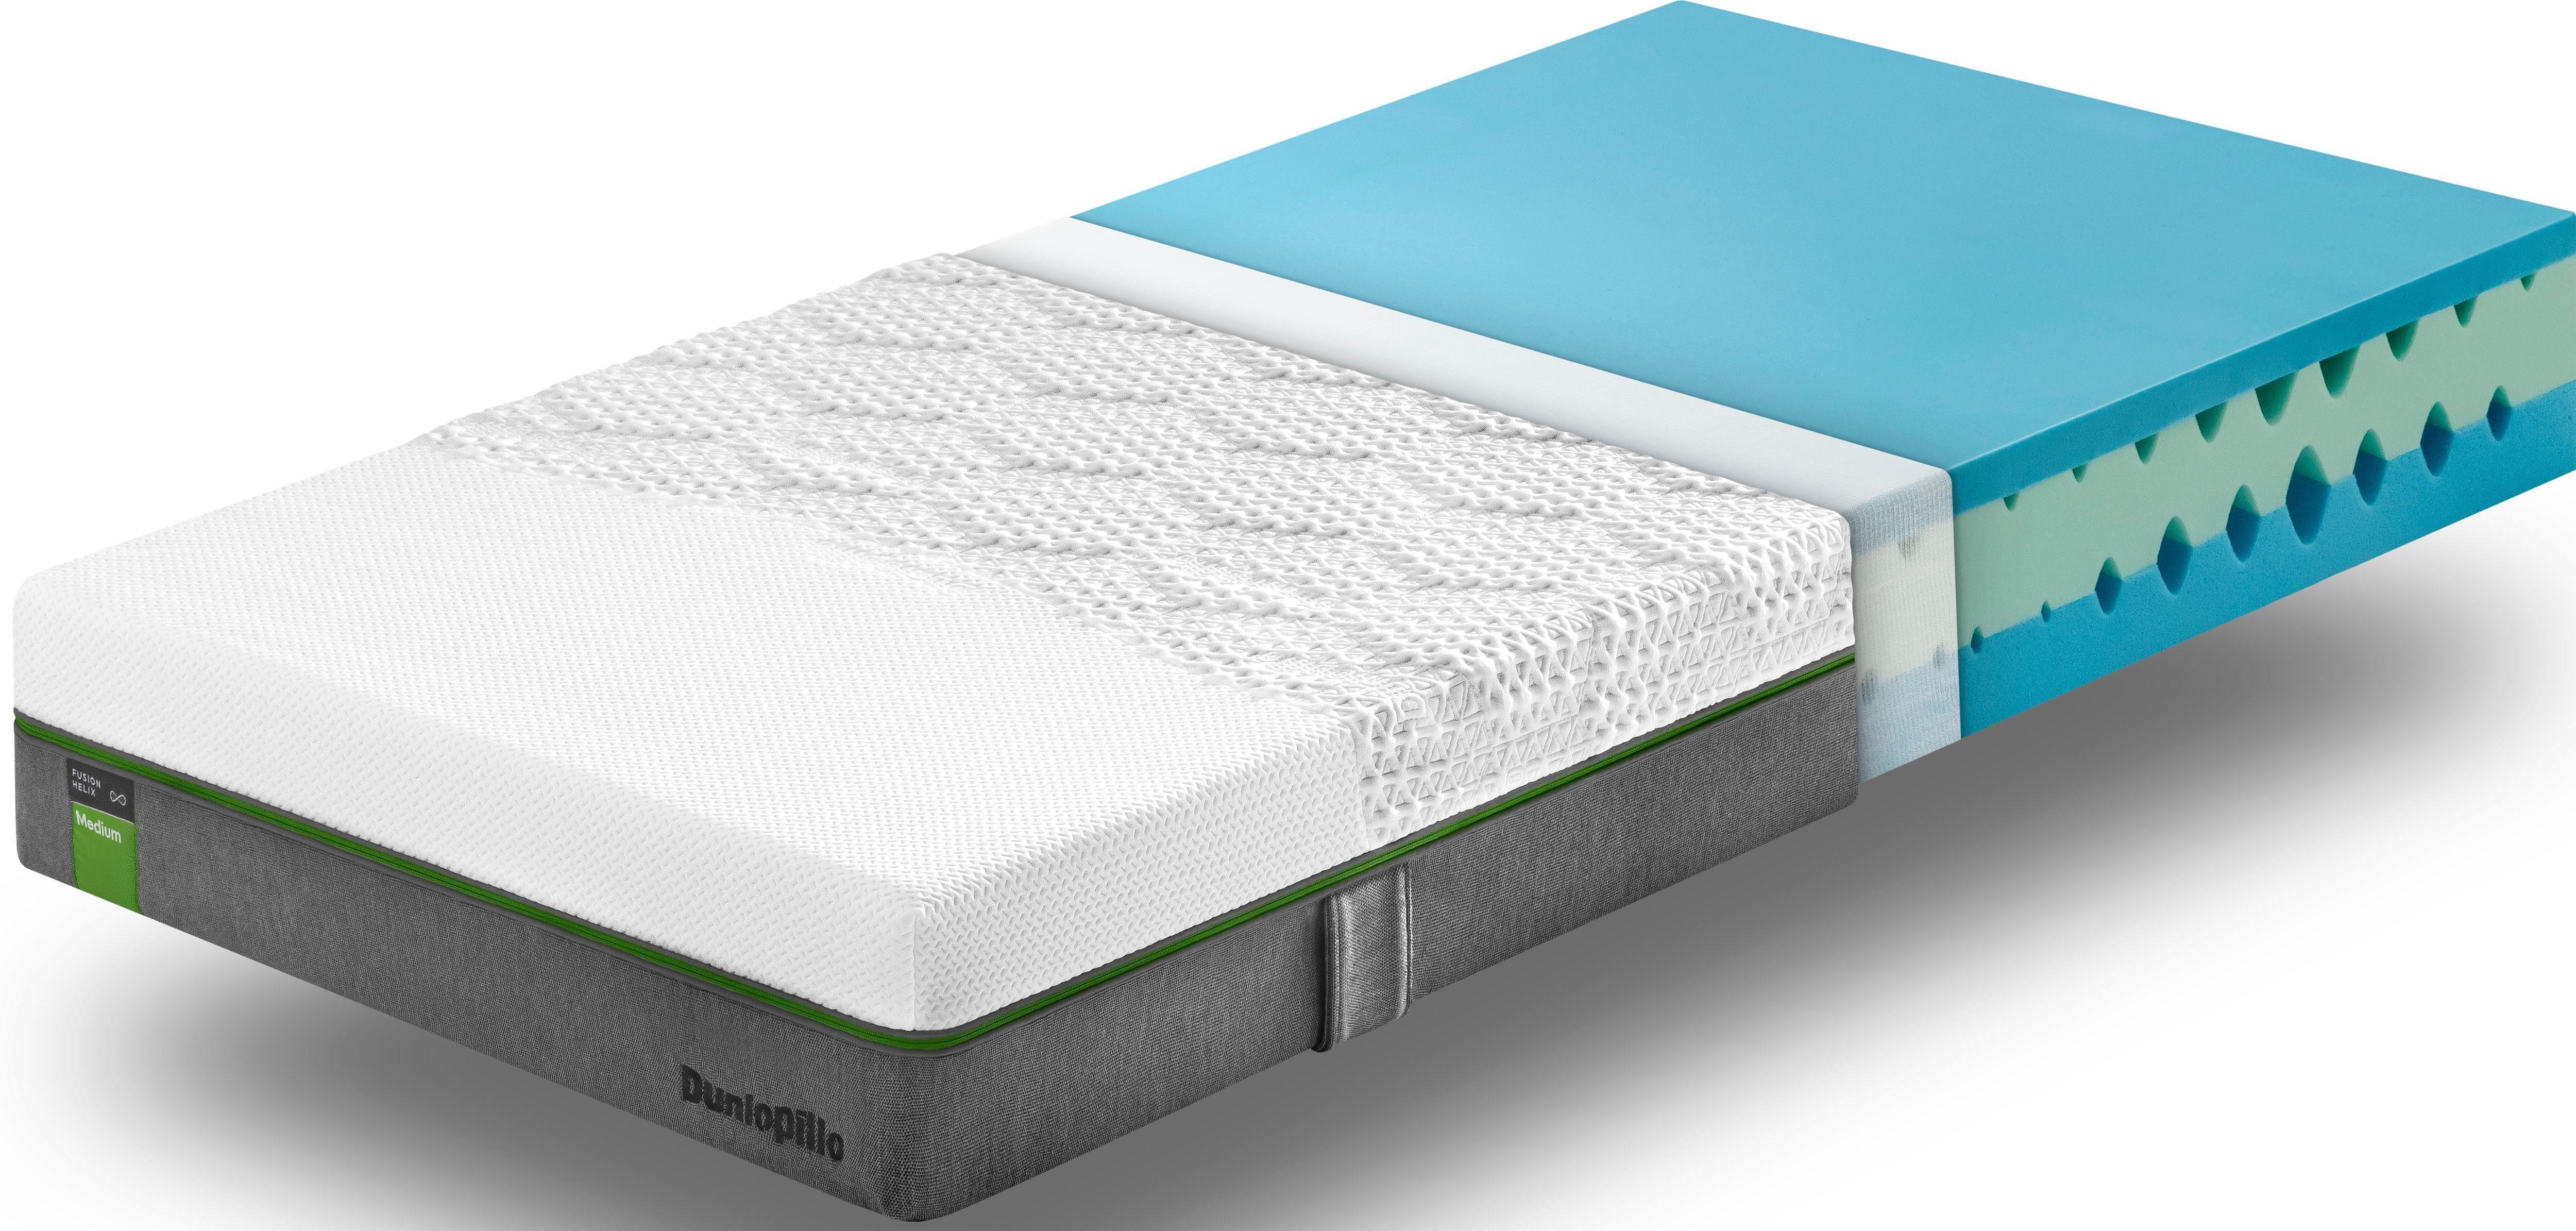 Kaltschaummatratze Fusion Helix Medium Dunlopillo better sleep 23 cm hoch